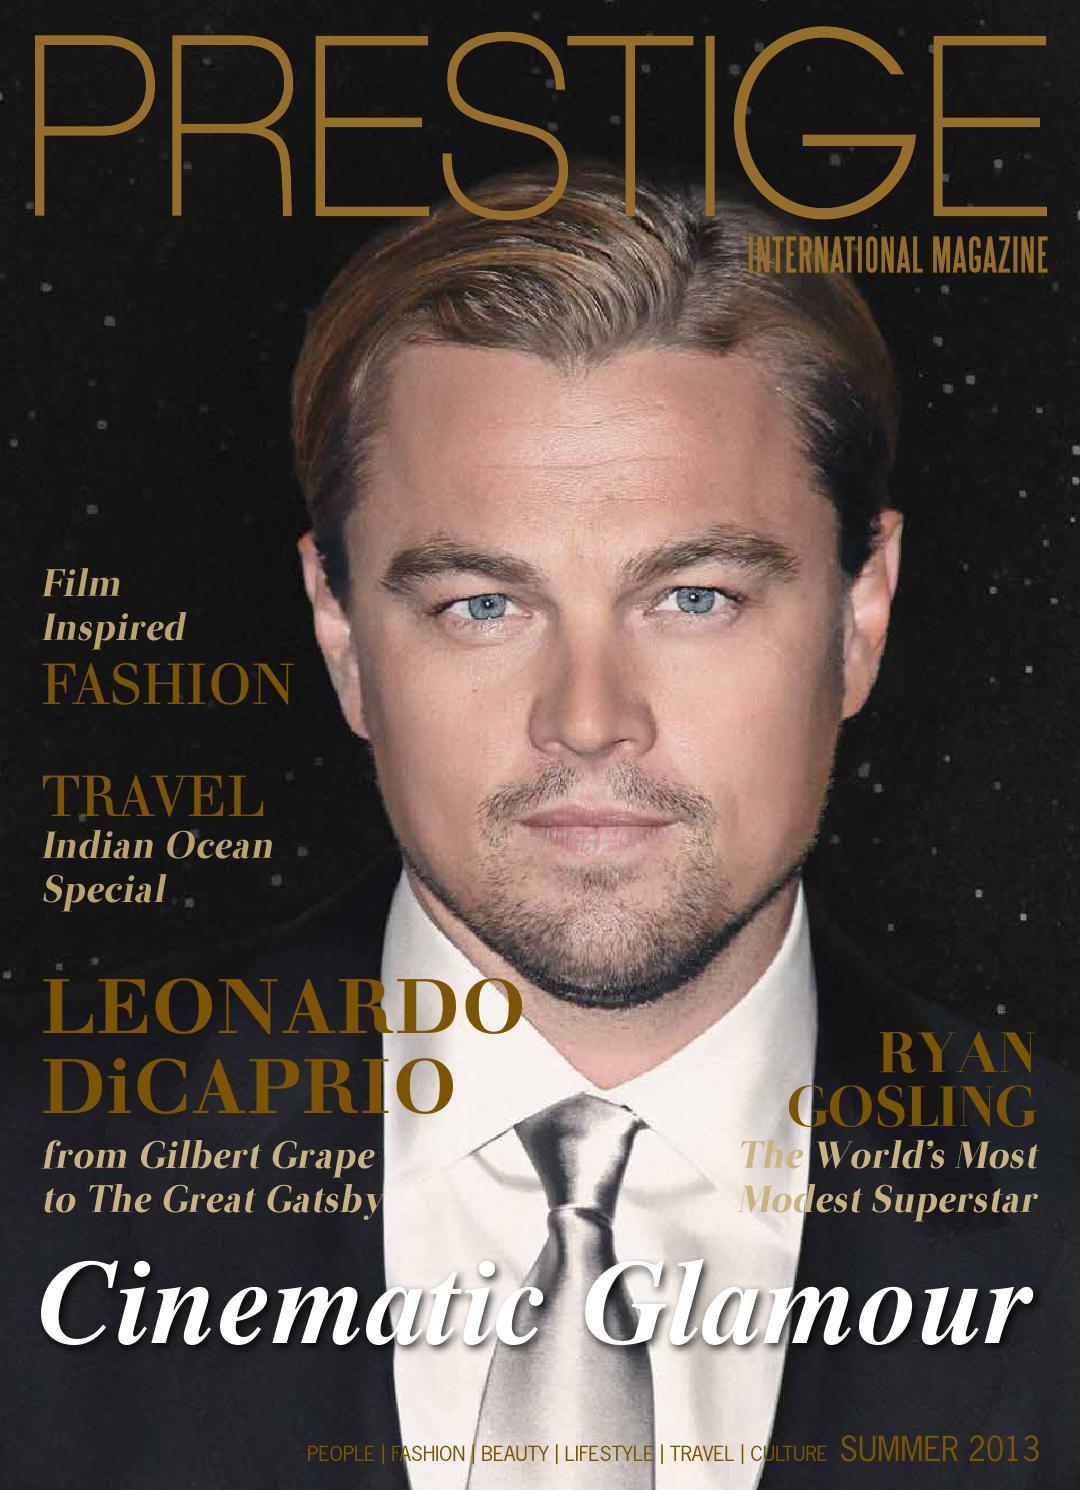 PRESTIGE INTERNATIONAL Magazine SUMMER 2013 by PRESTIGE INTERNATIONAL  MAGAZINE - issuu 79c61f21c5f